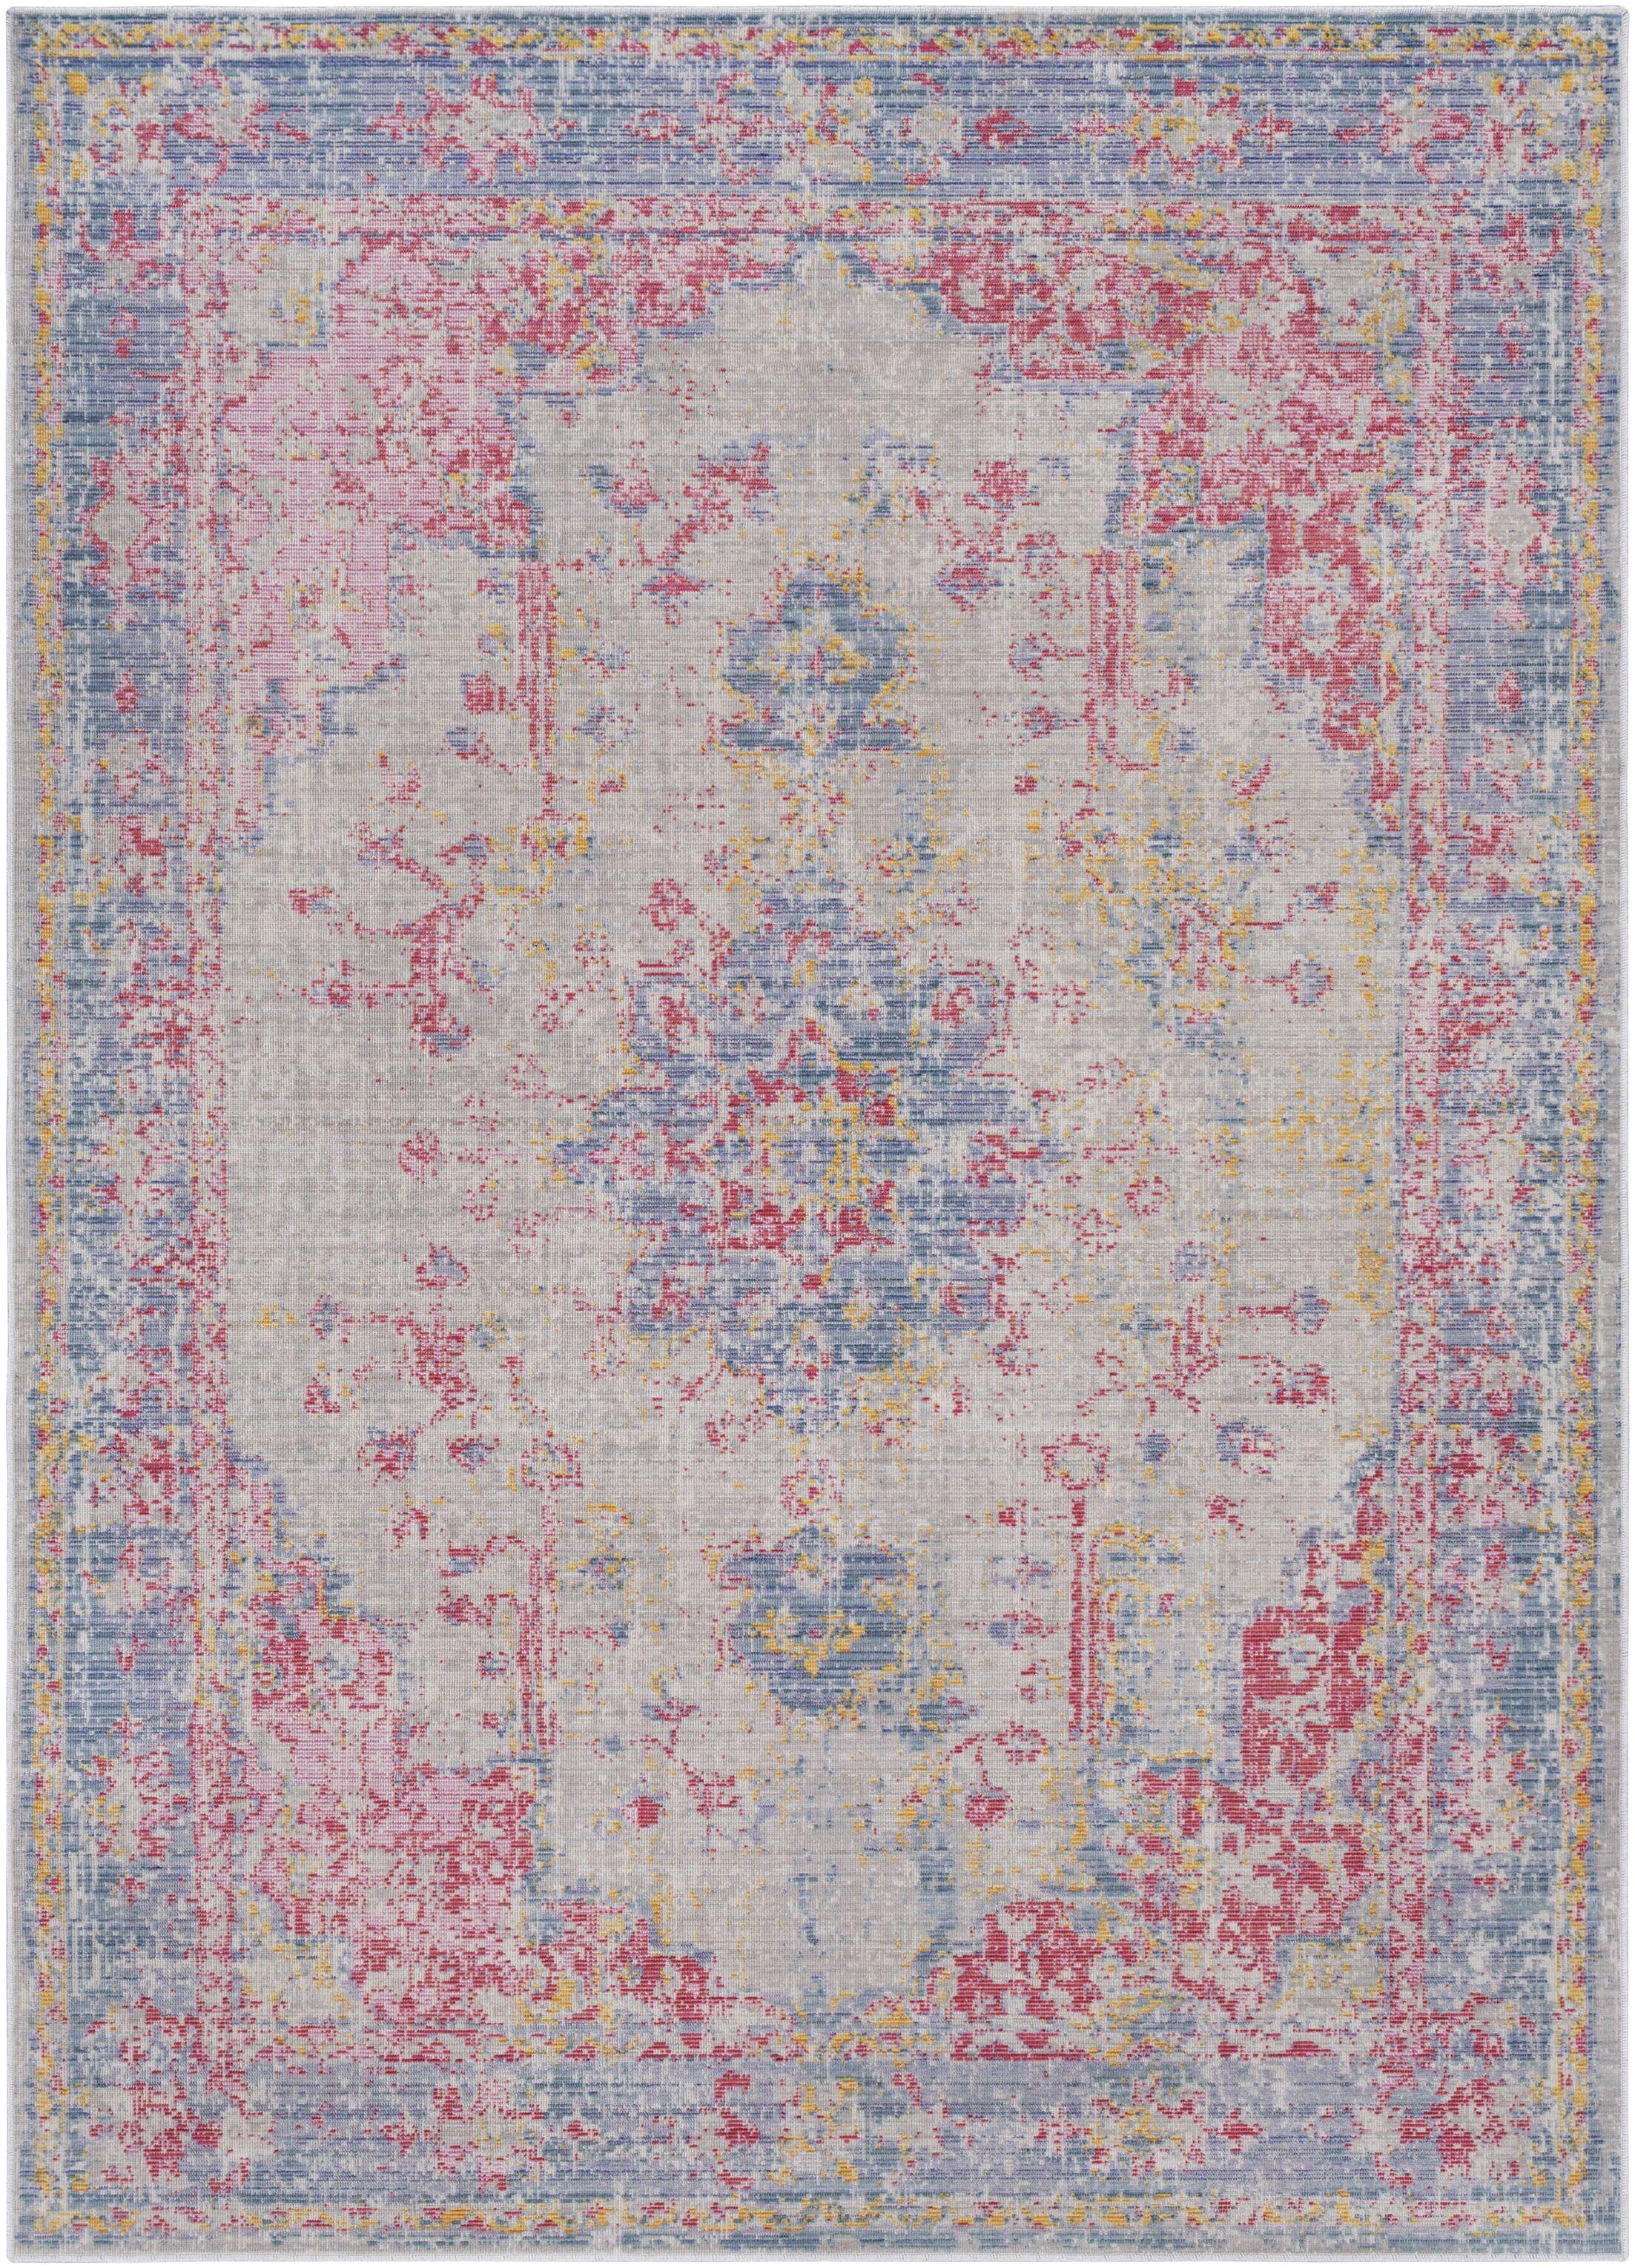 Kahina Vintage Distressed Oriental Pink/Blue Area Rug Rug Size: Rectangle 9' x 13'